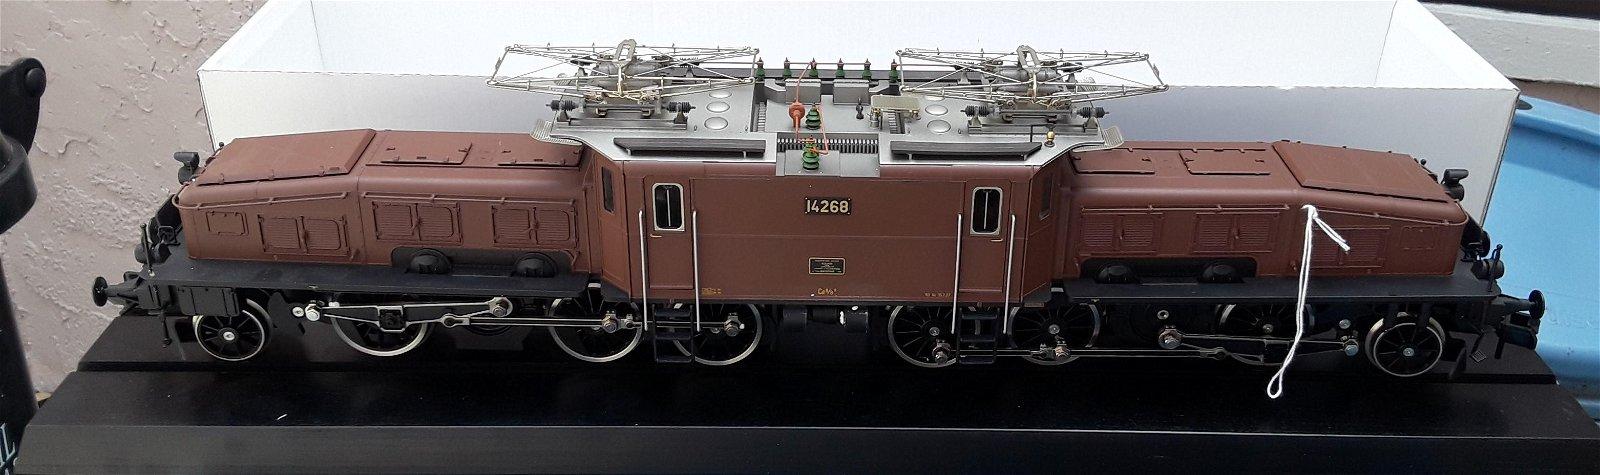 Marklin Swiss Krokodil, Gauge 1. The locomotive comes